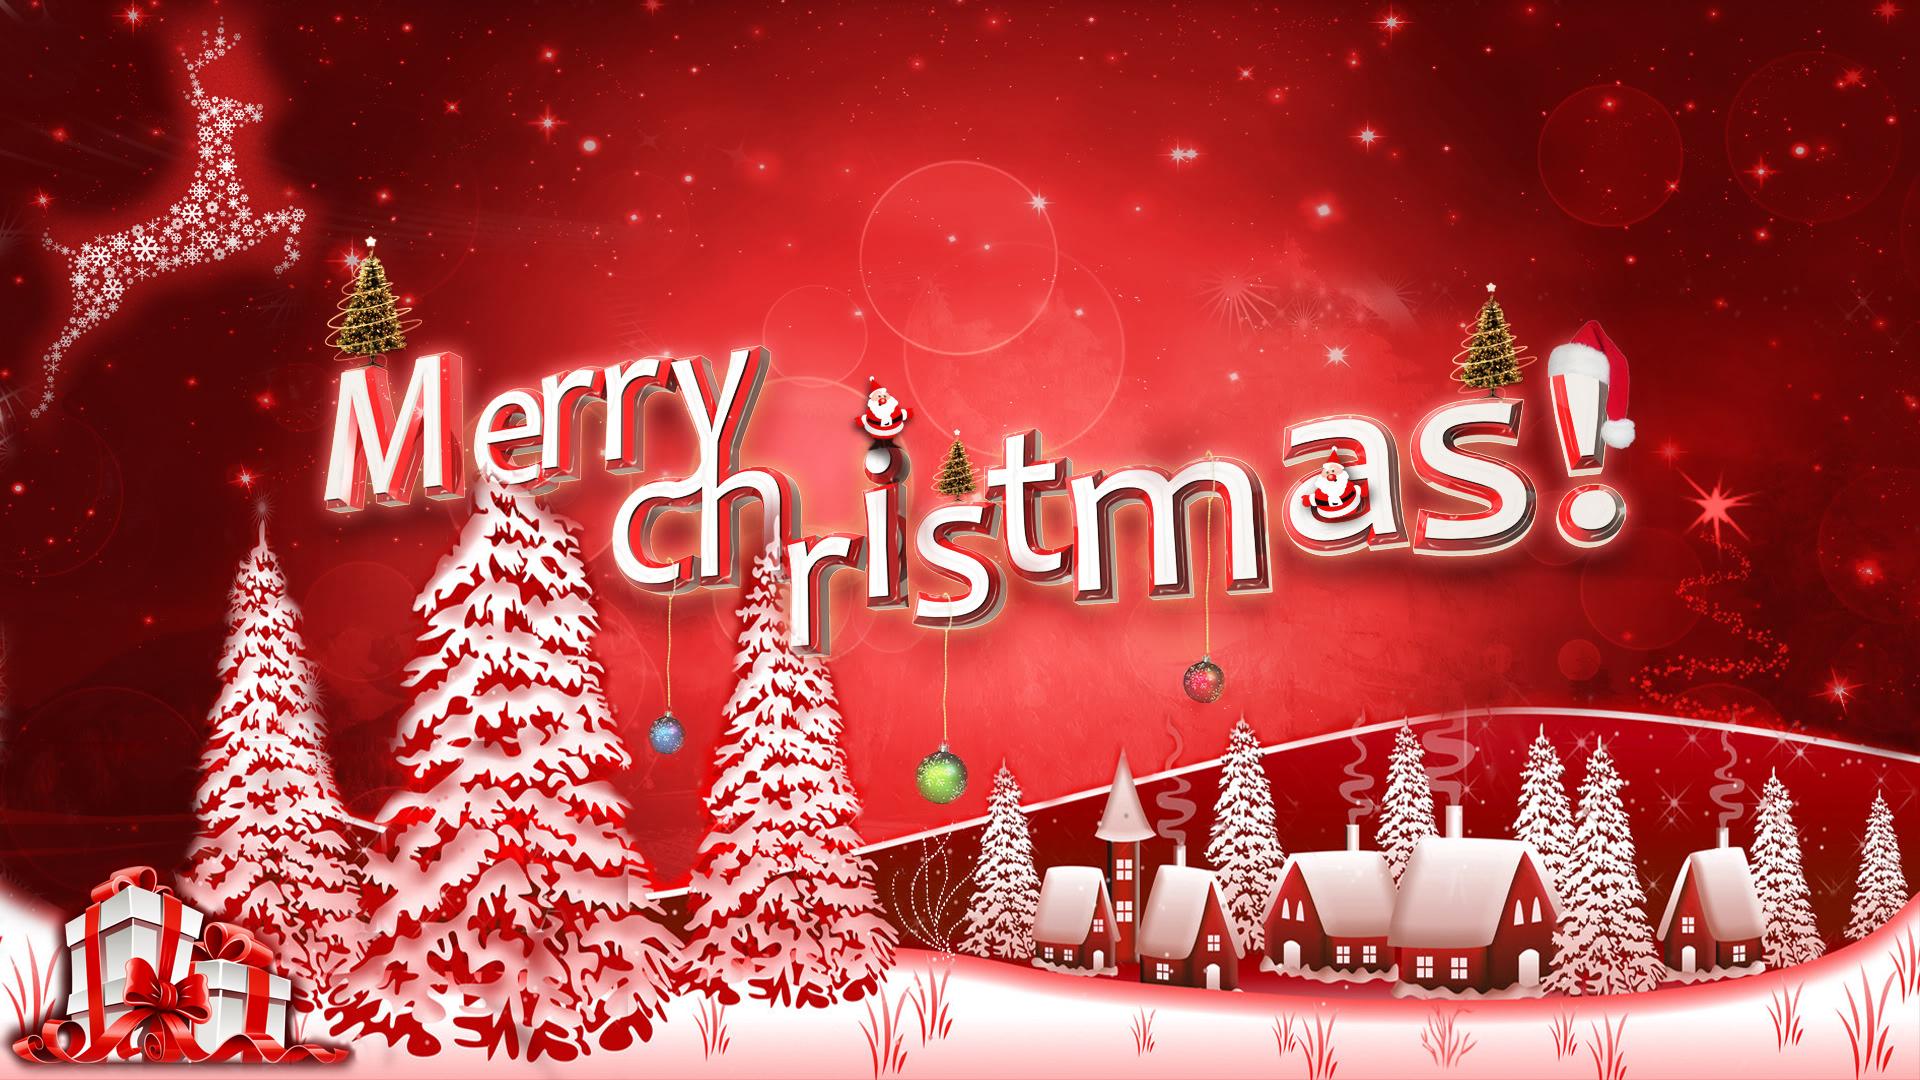 Happy Merry Christmas December Wallpaper